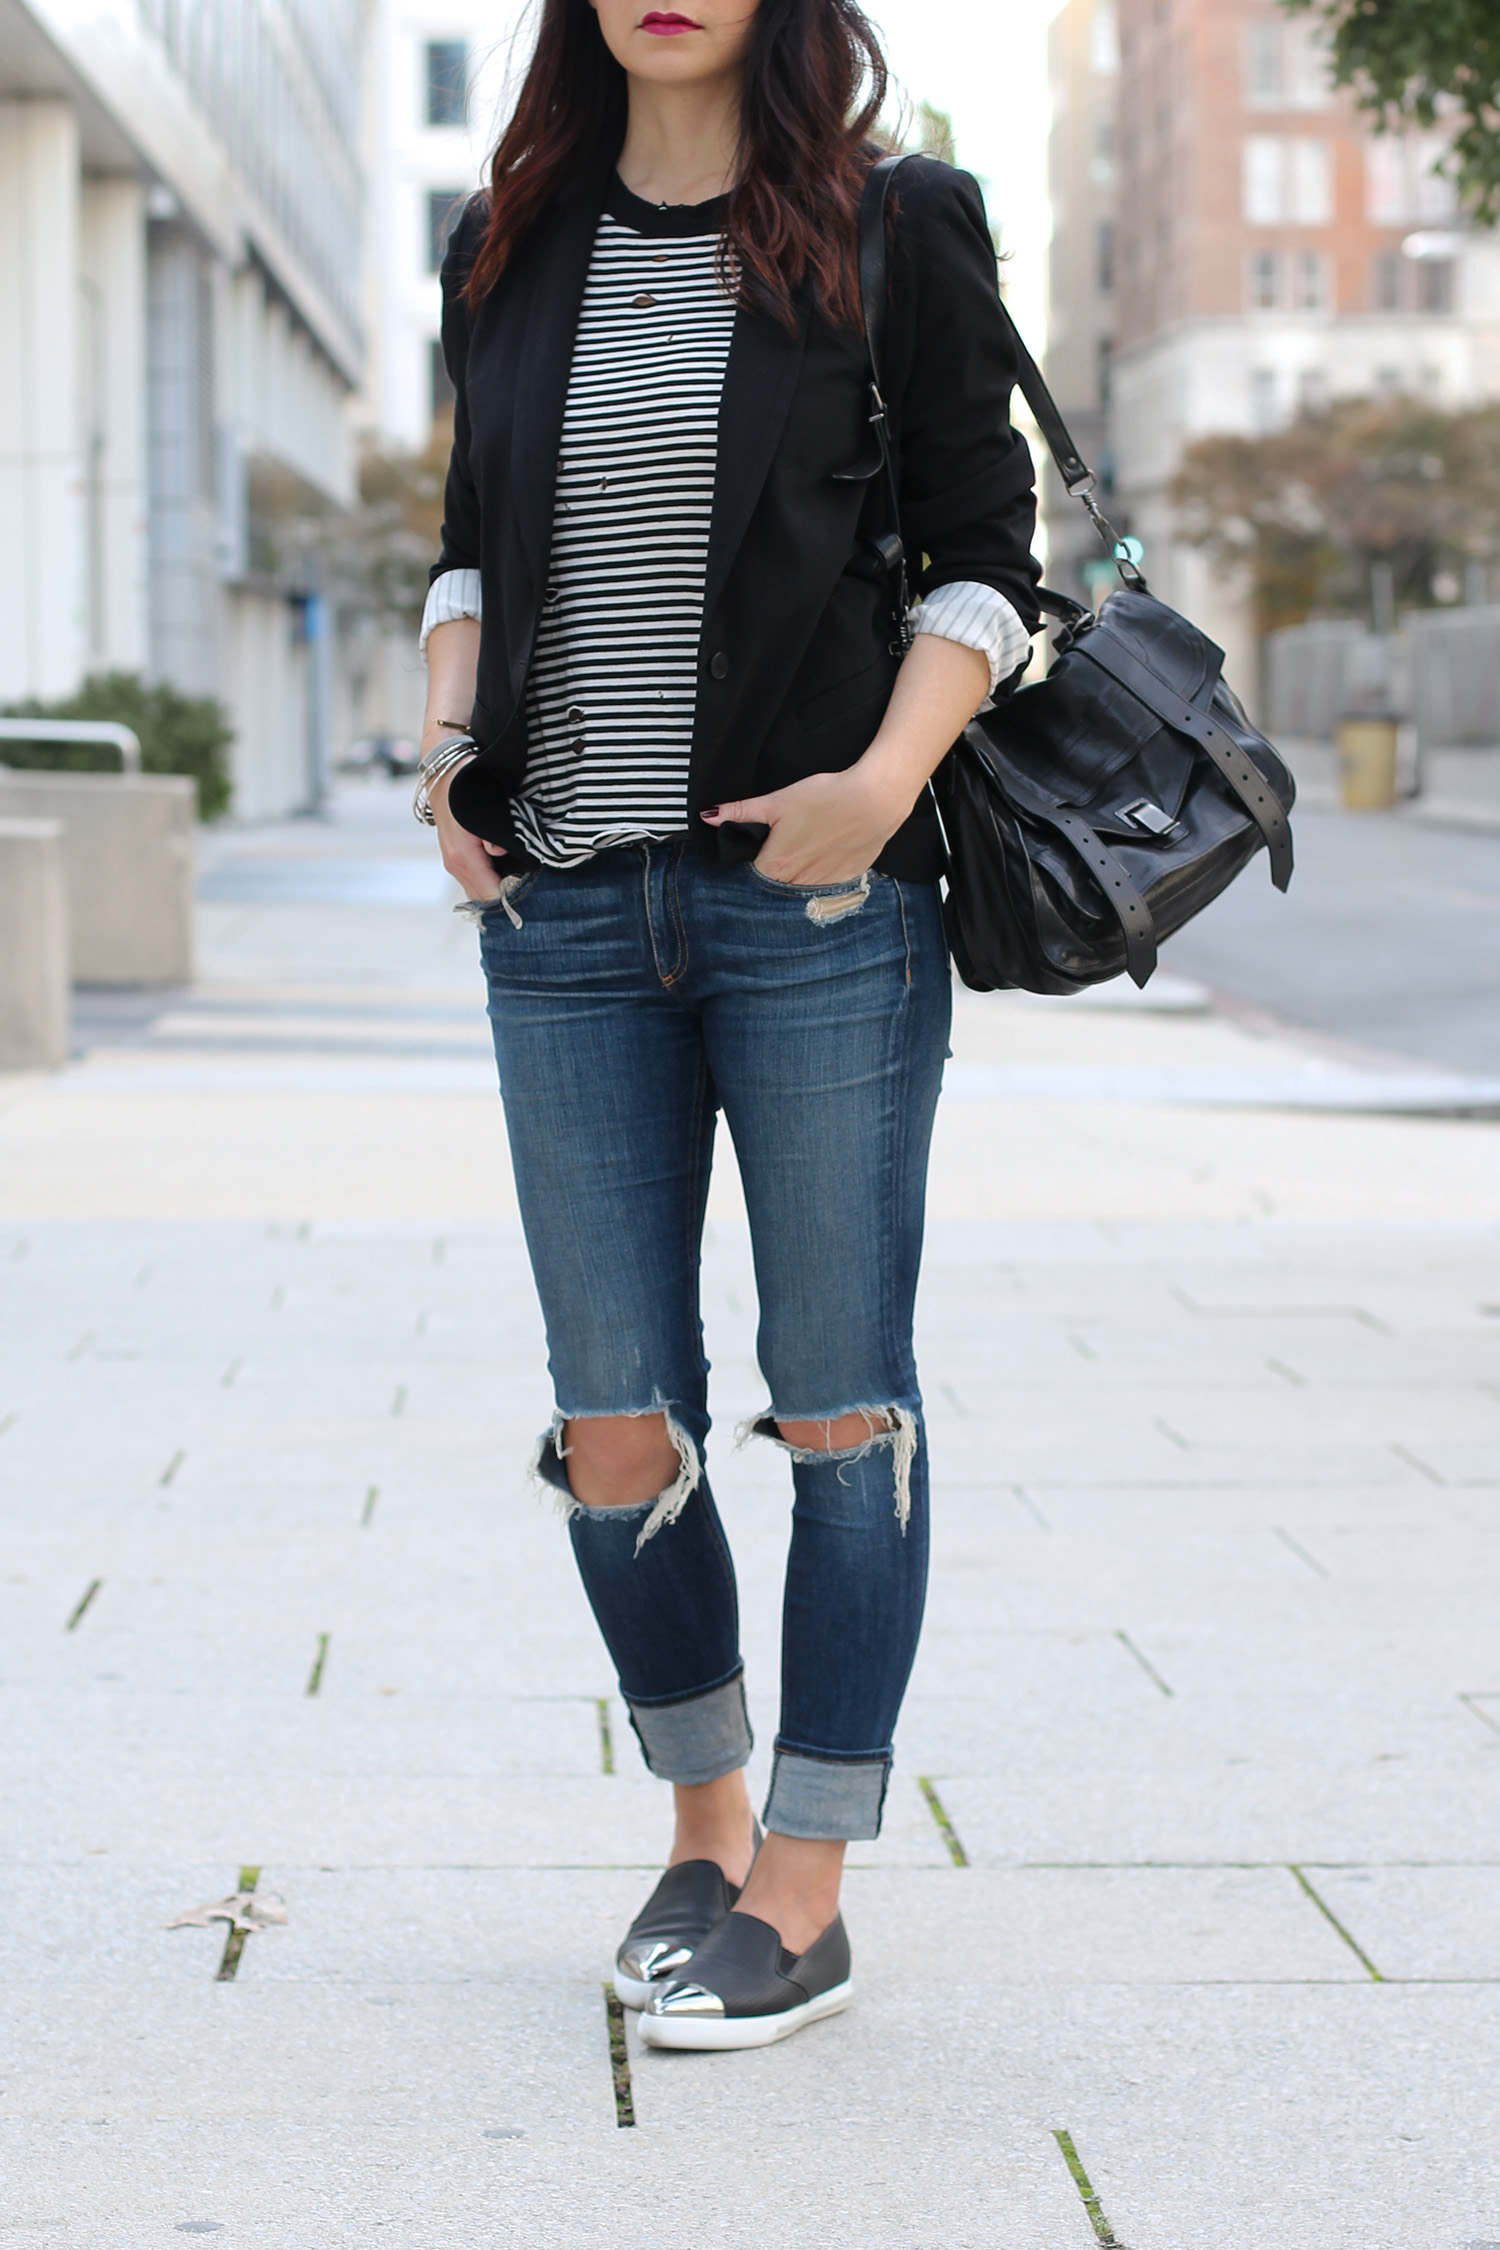 n:Philanthropy Shirt, Rag and Bone Jeans